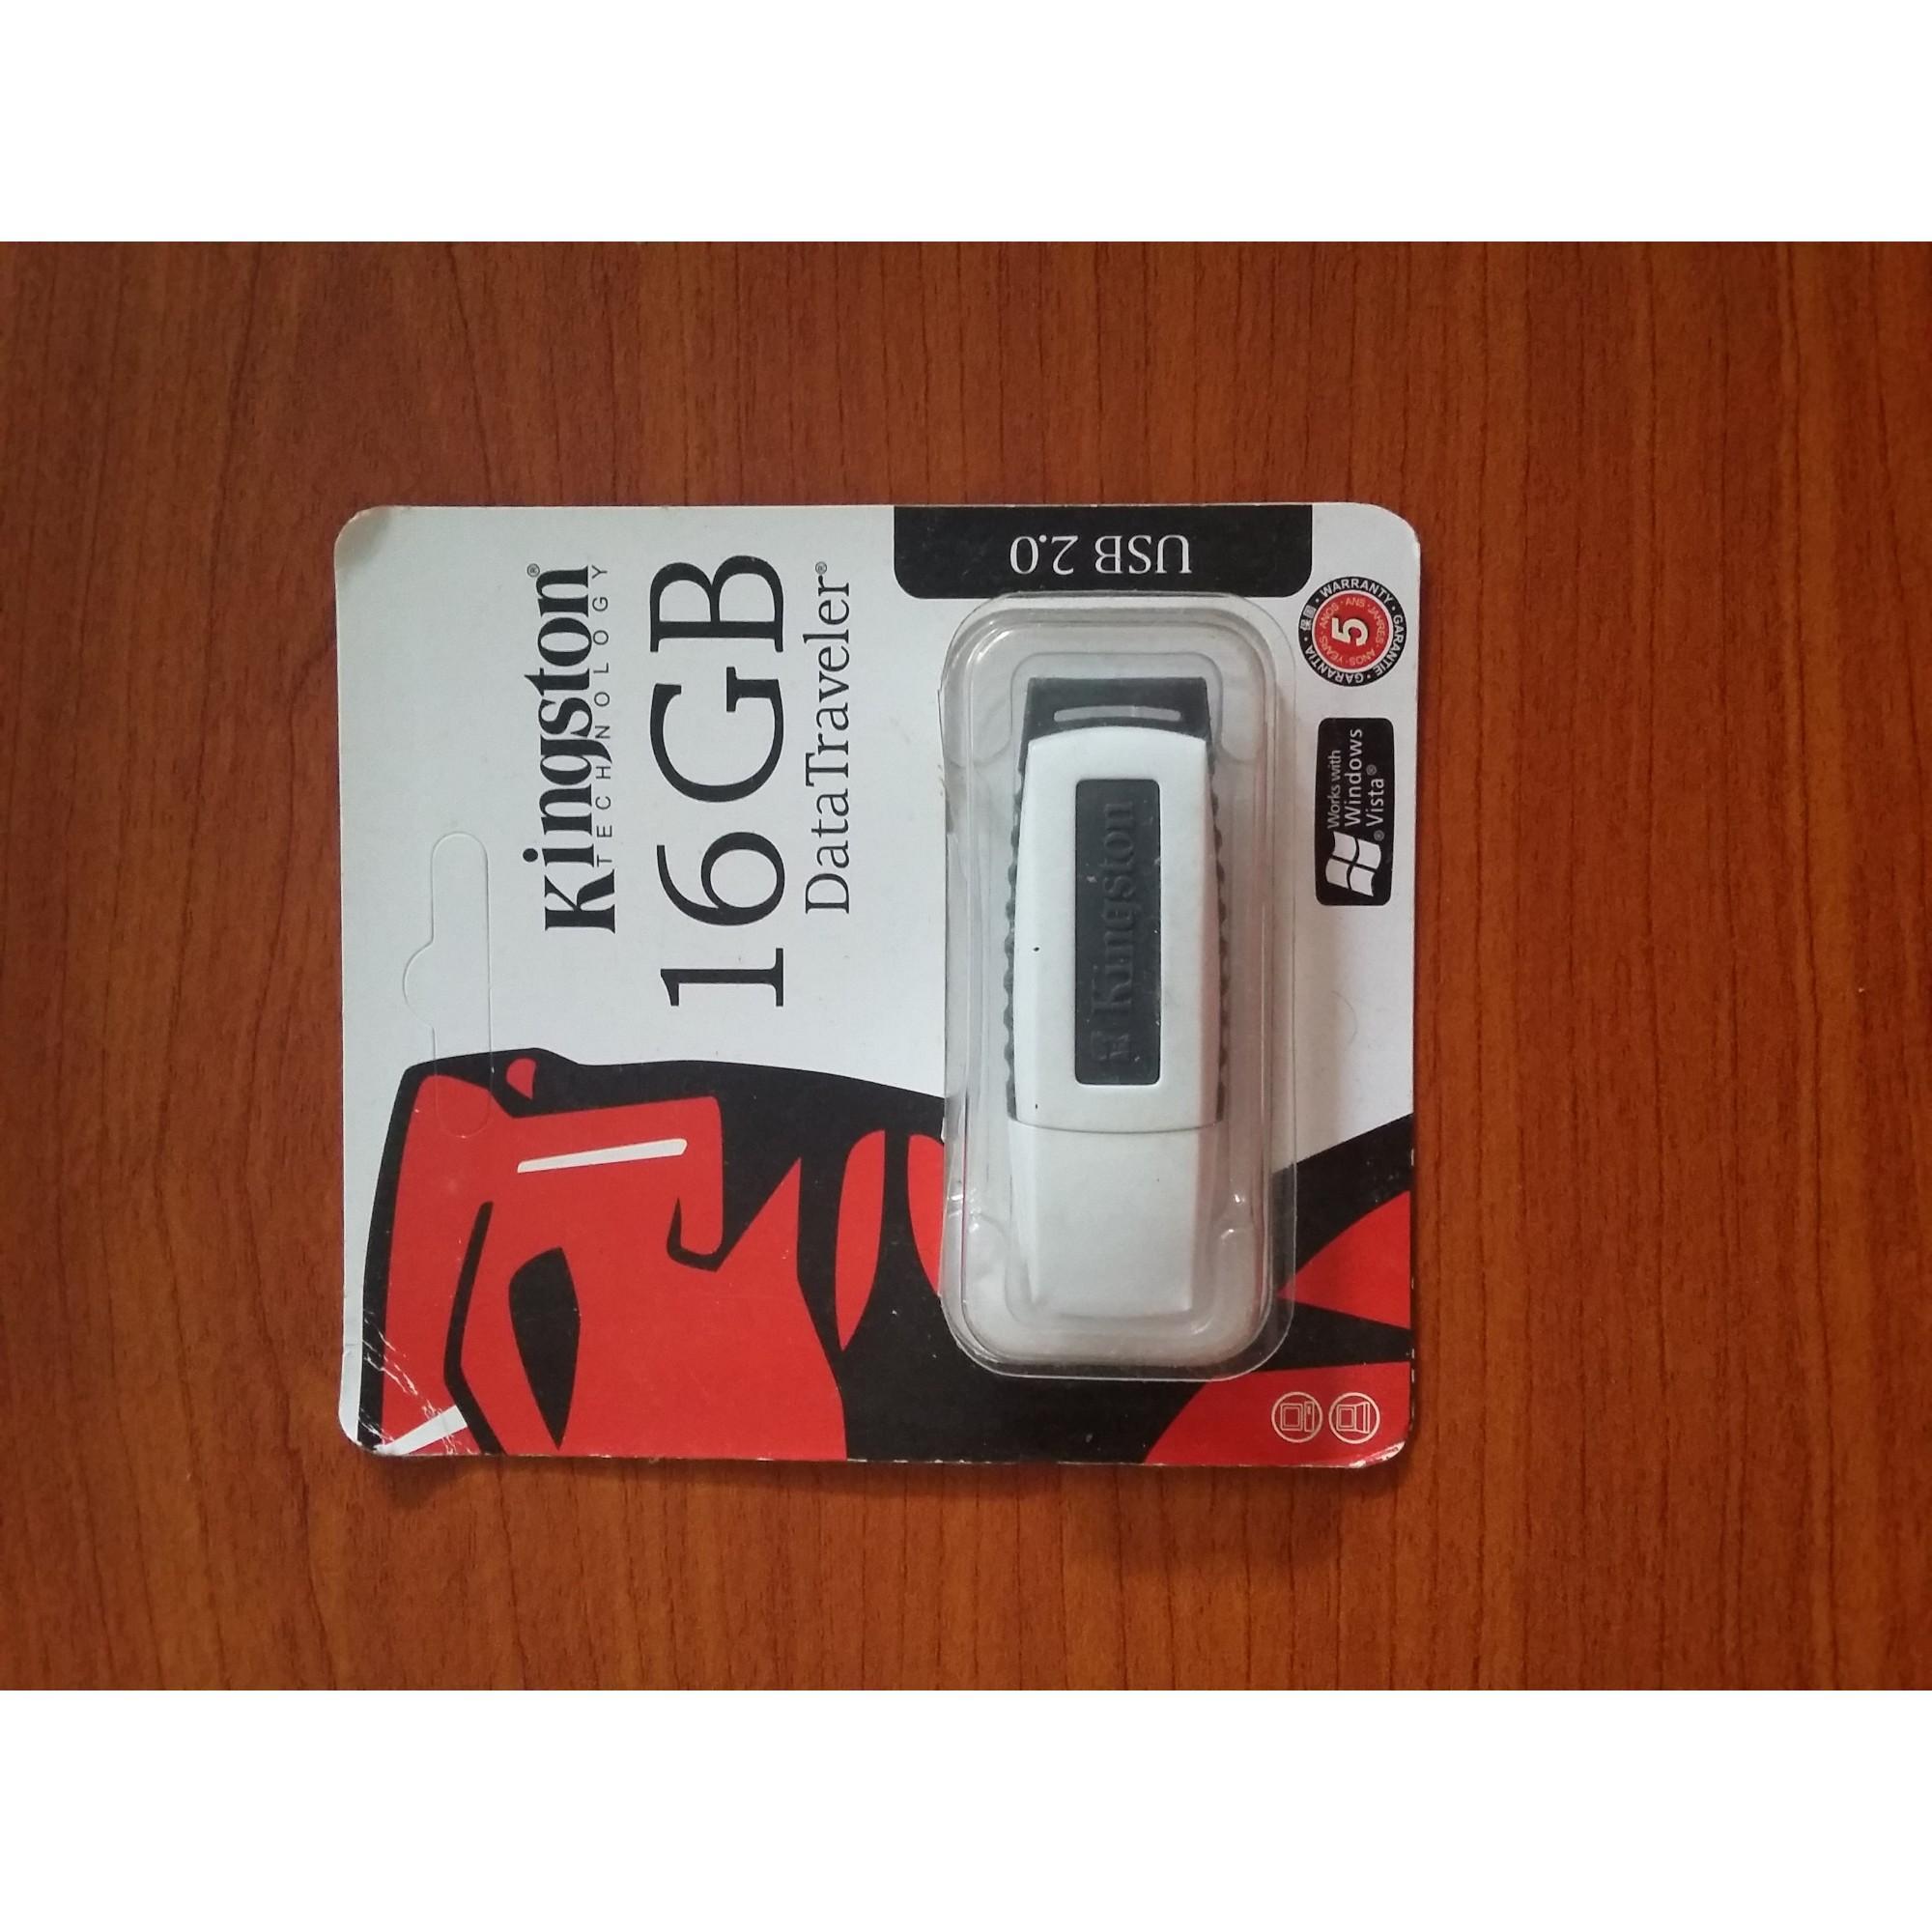 Usb Flash Drives At Best Prices In Sri Lanka Flashdisk 16gb Disk Toshiba Kingston Datatraveler Pen Drive